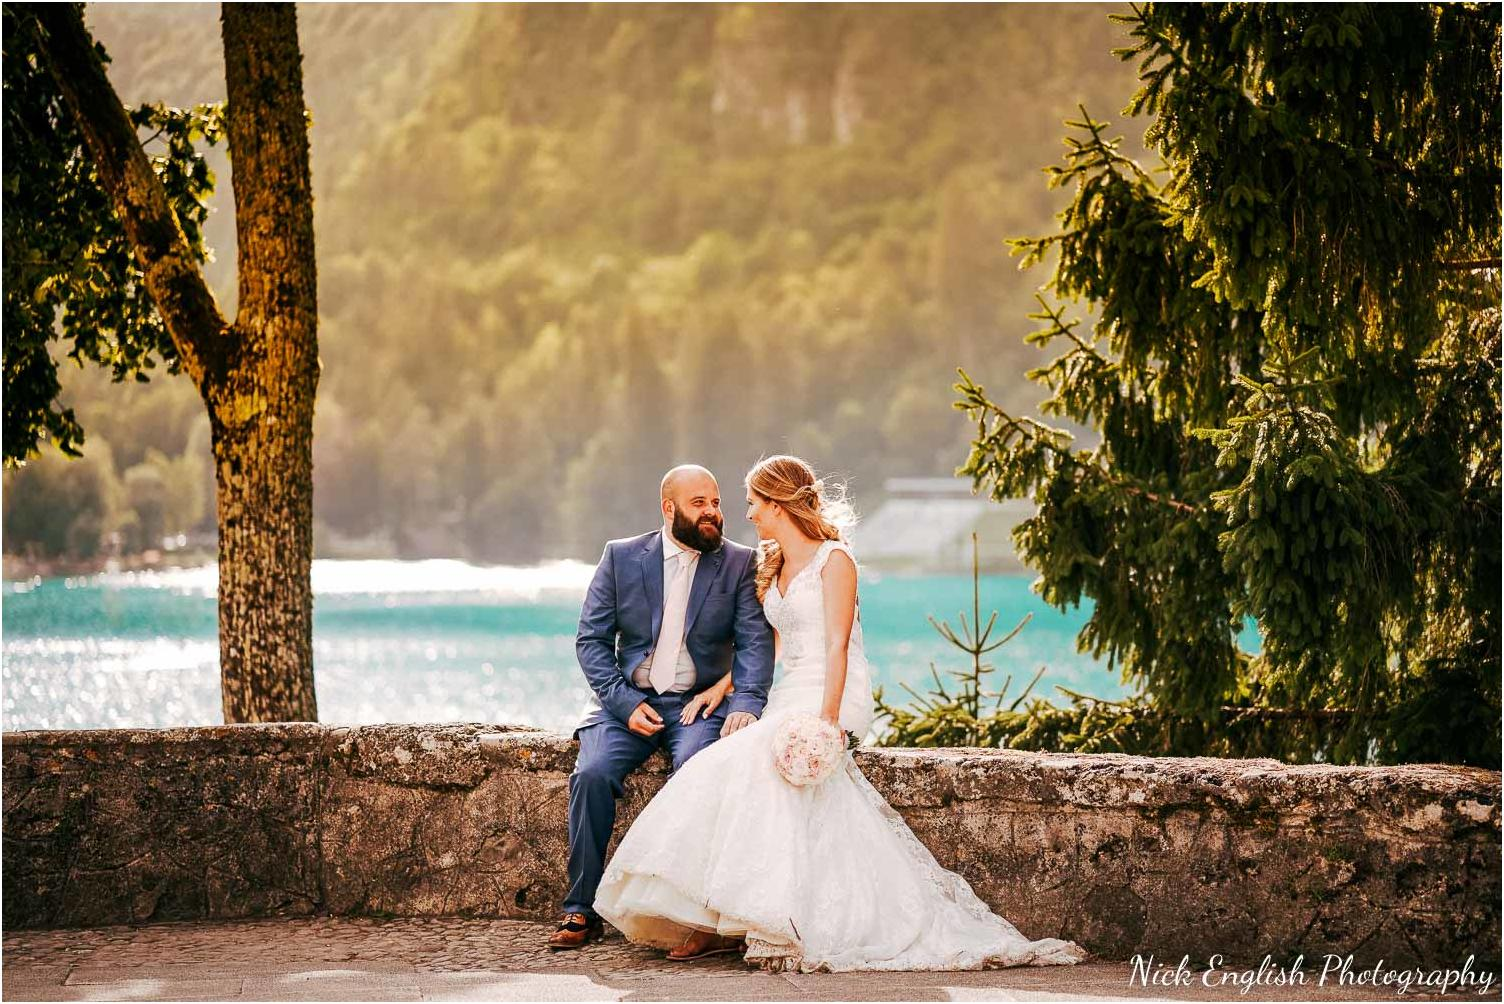 Destination_Wedding_Photographer_Slovenia_Nick_English_Photography-70-11.jpg